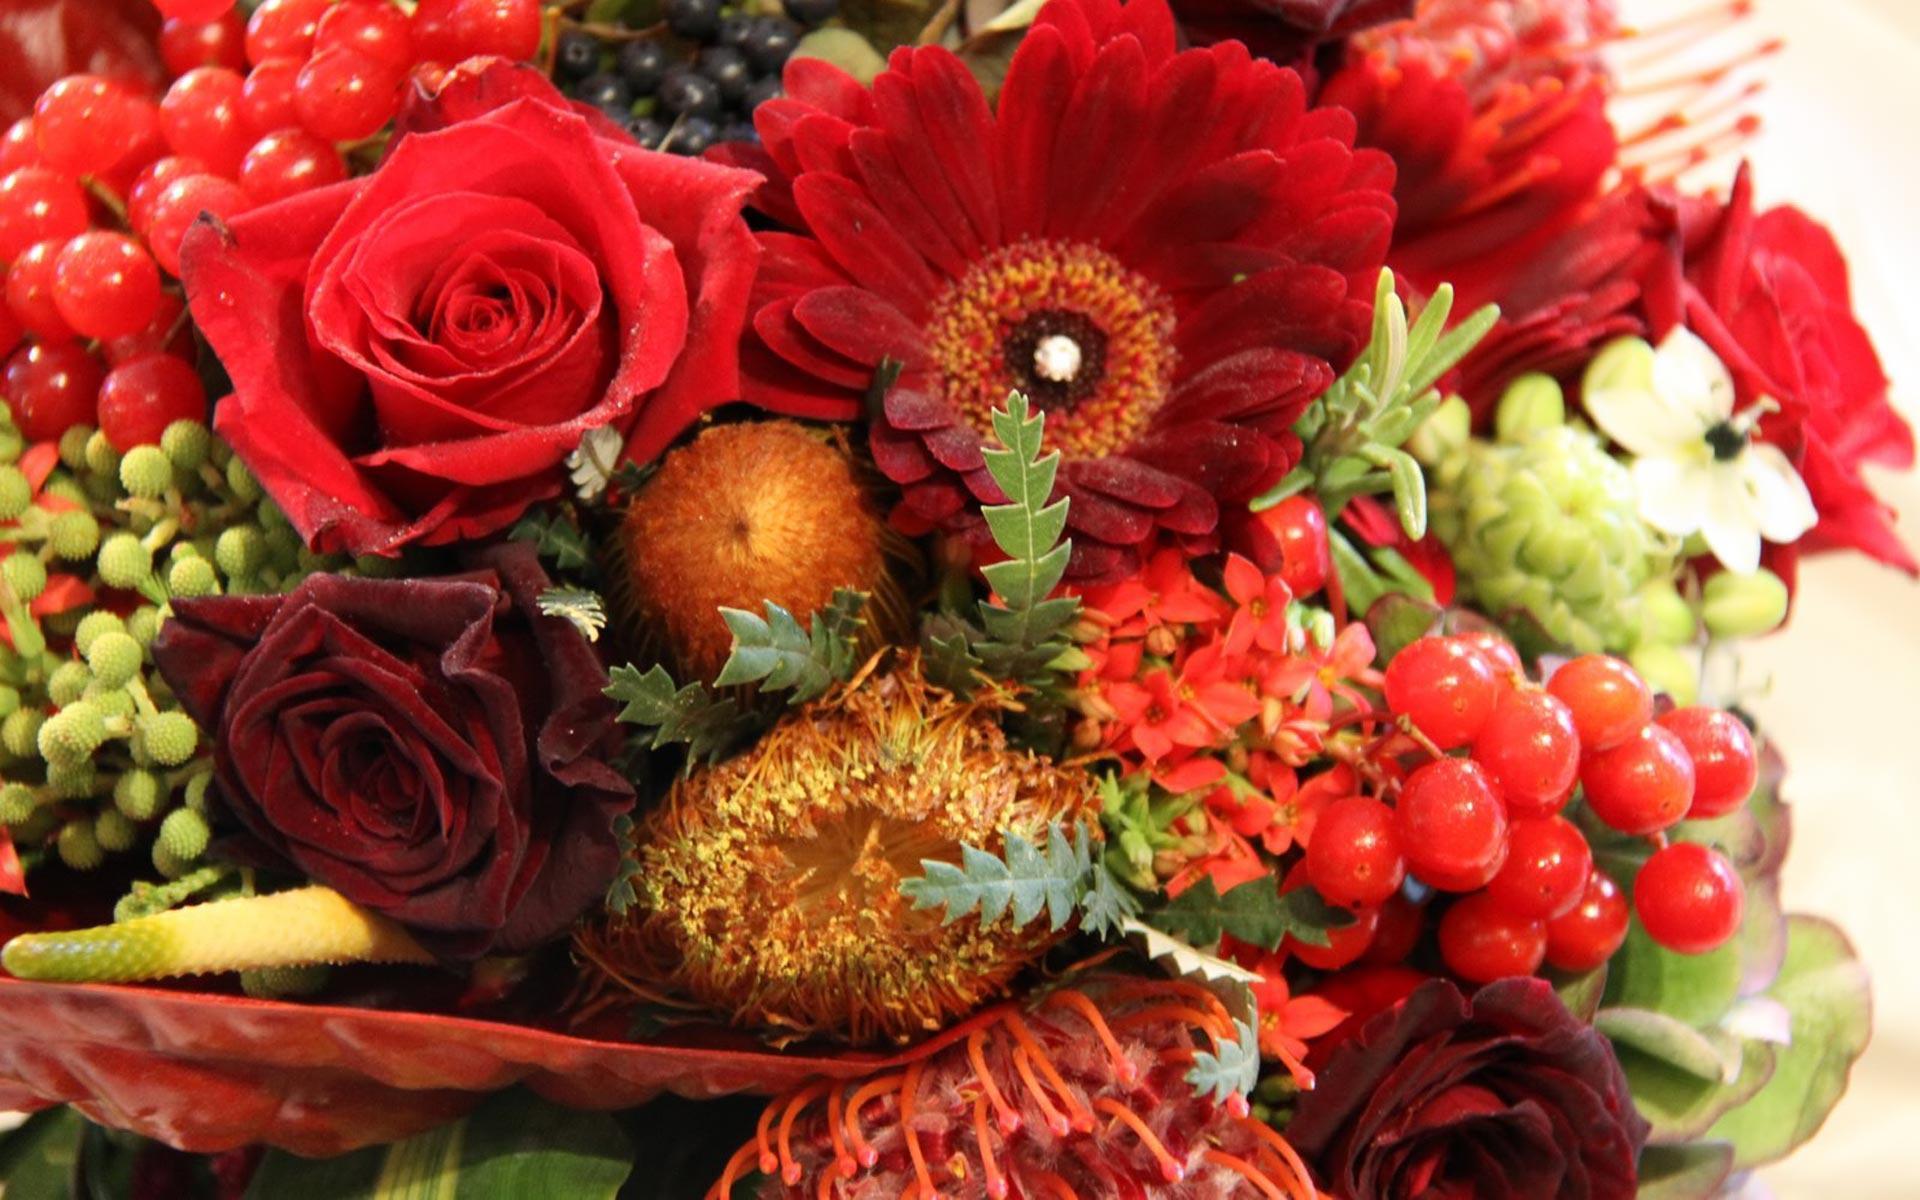 Flower garden wallpaper background - Flower Garden Wallpaper Desktop Wallpaper Flowerhdwallpaper